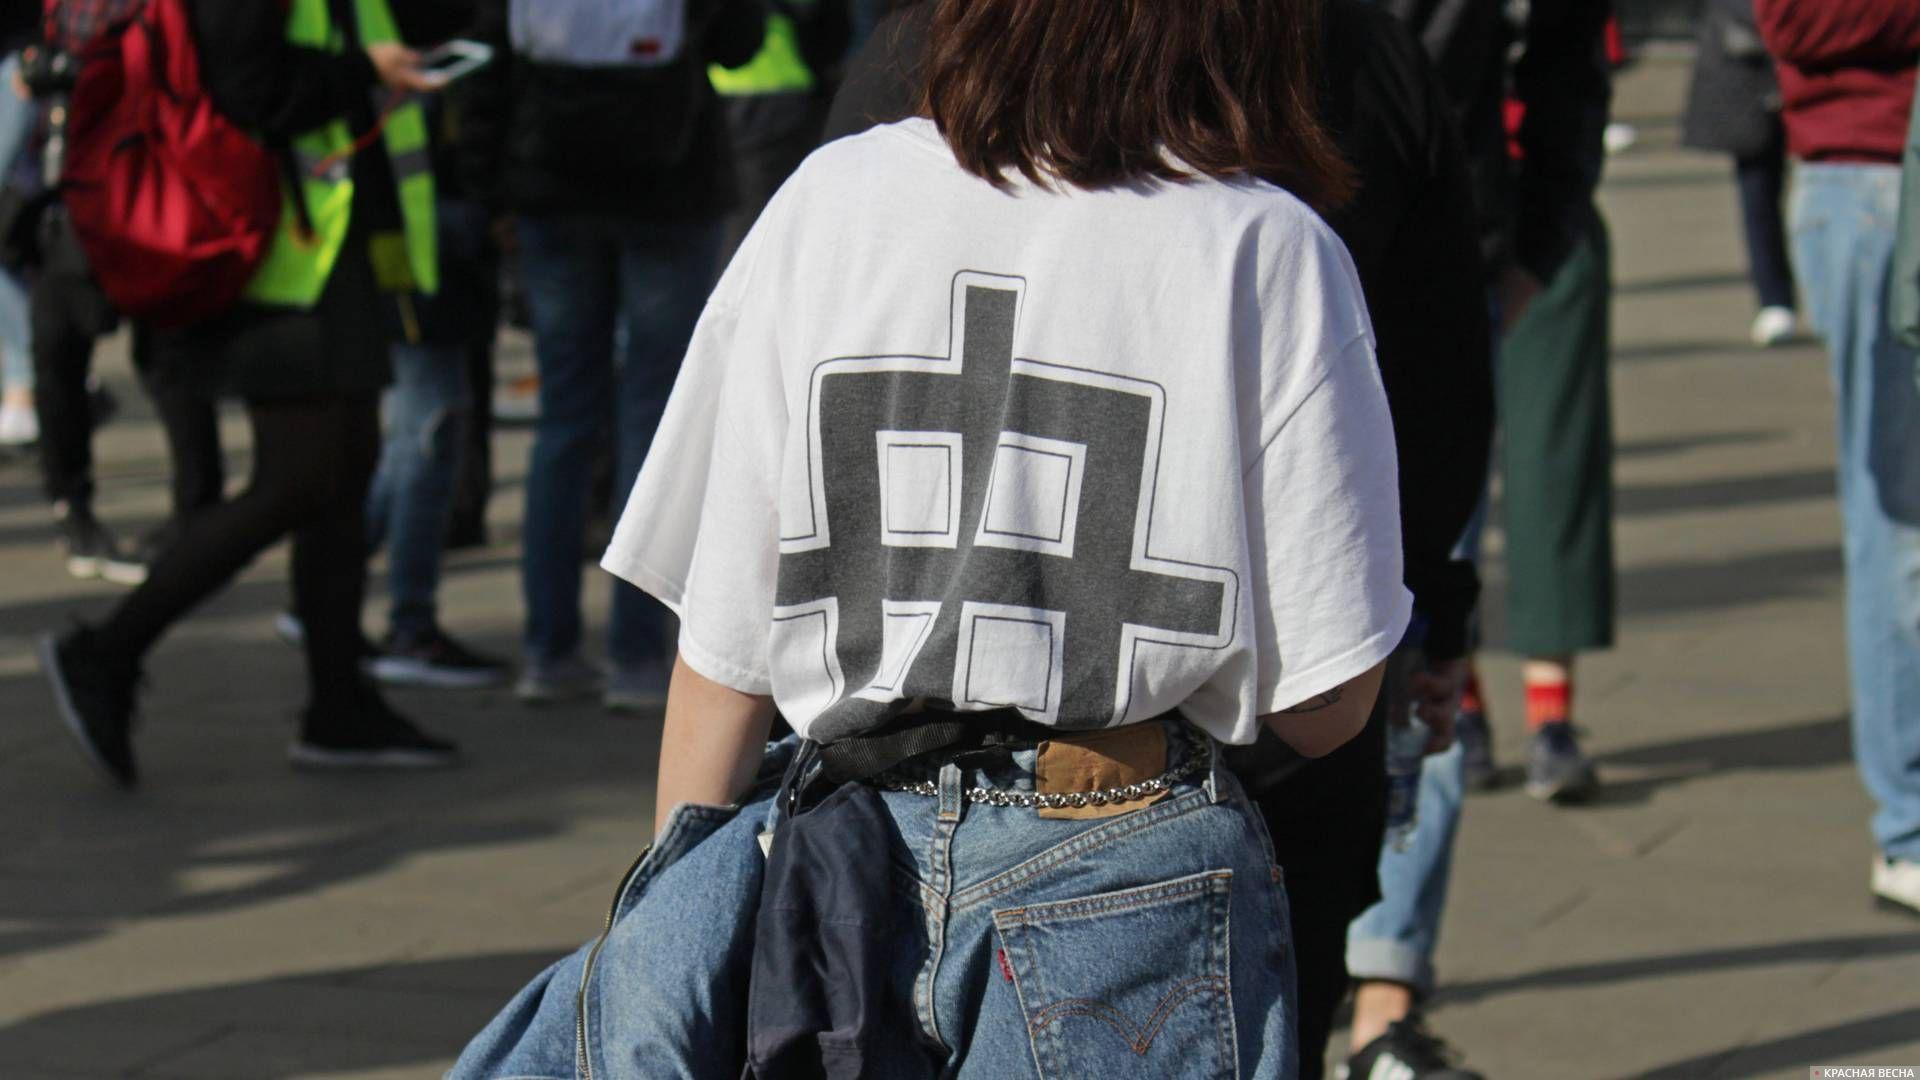 Неонацистский символ